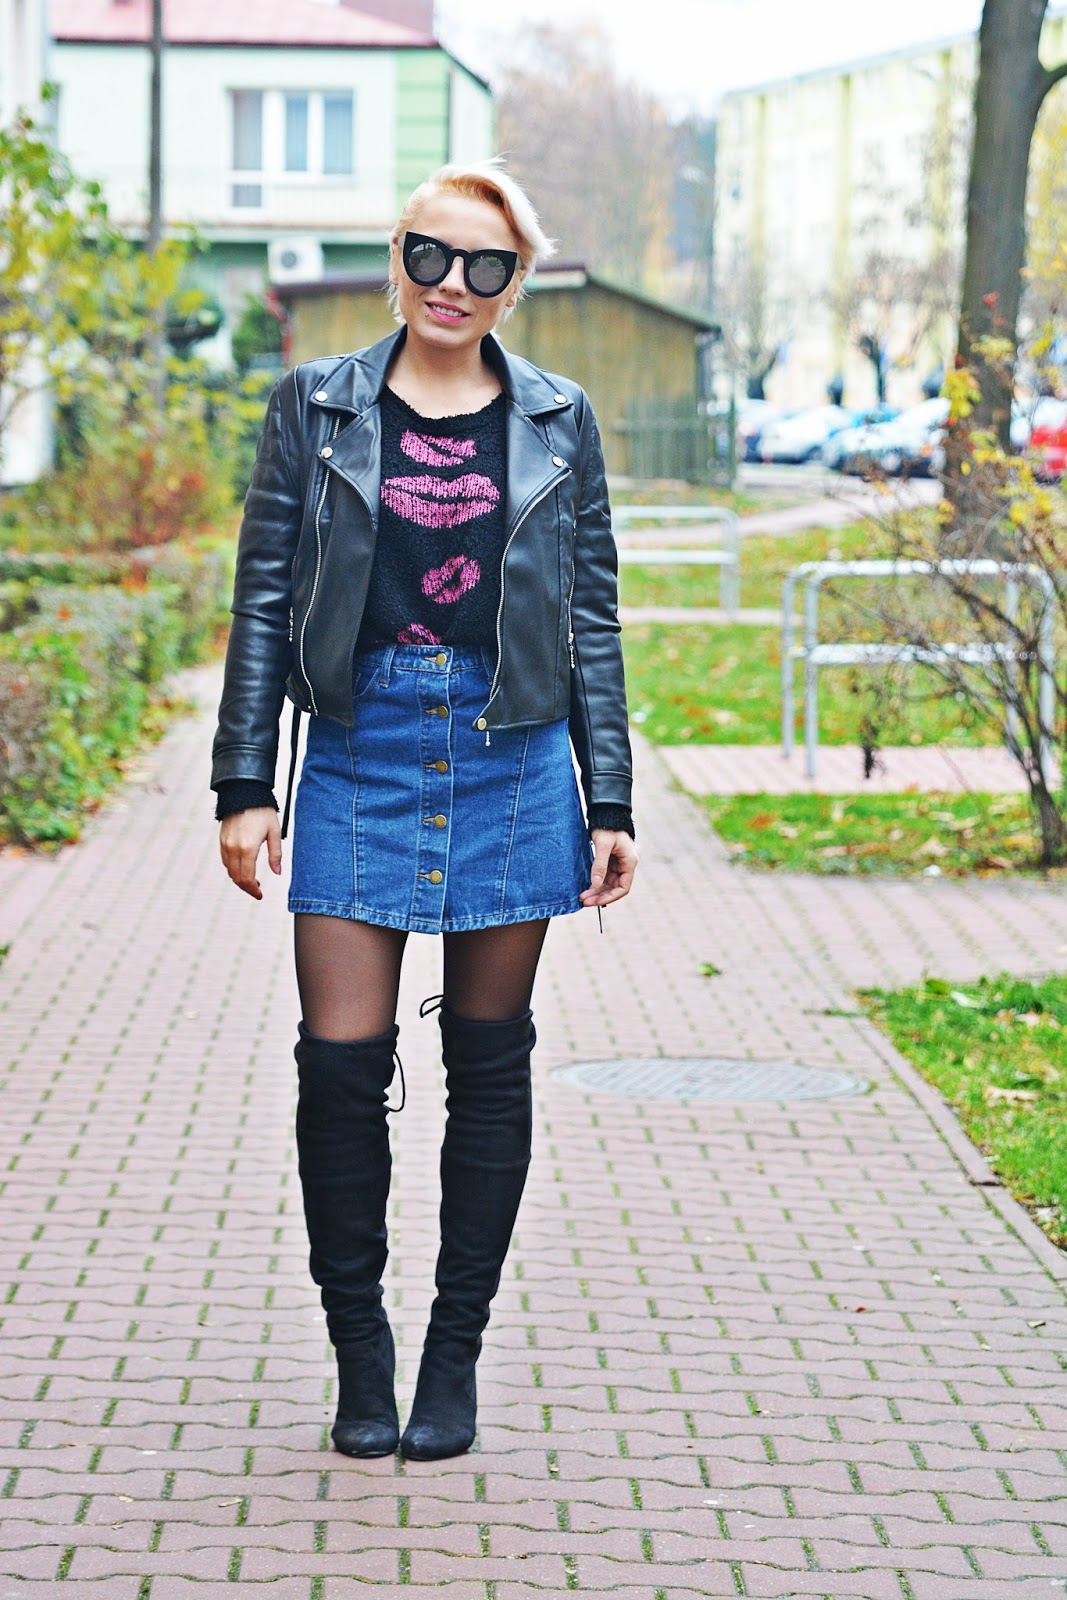 jeansowa_spodnica_skorzana_ramoneska_buty_za_kolano_karyn8